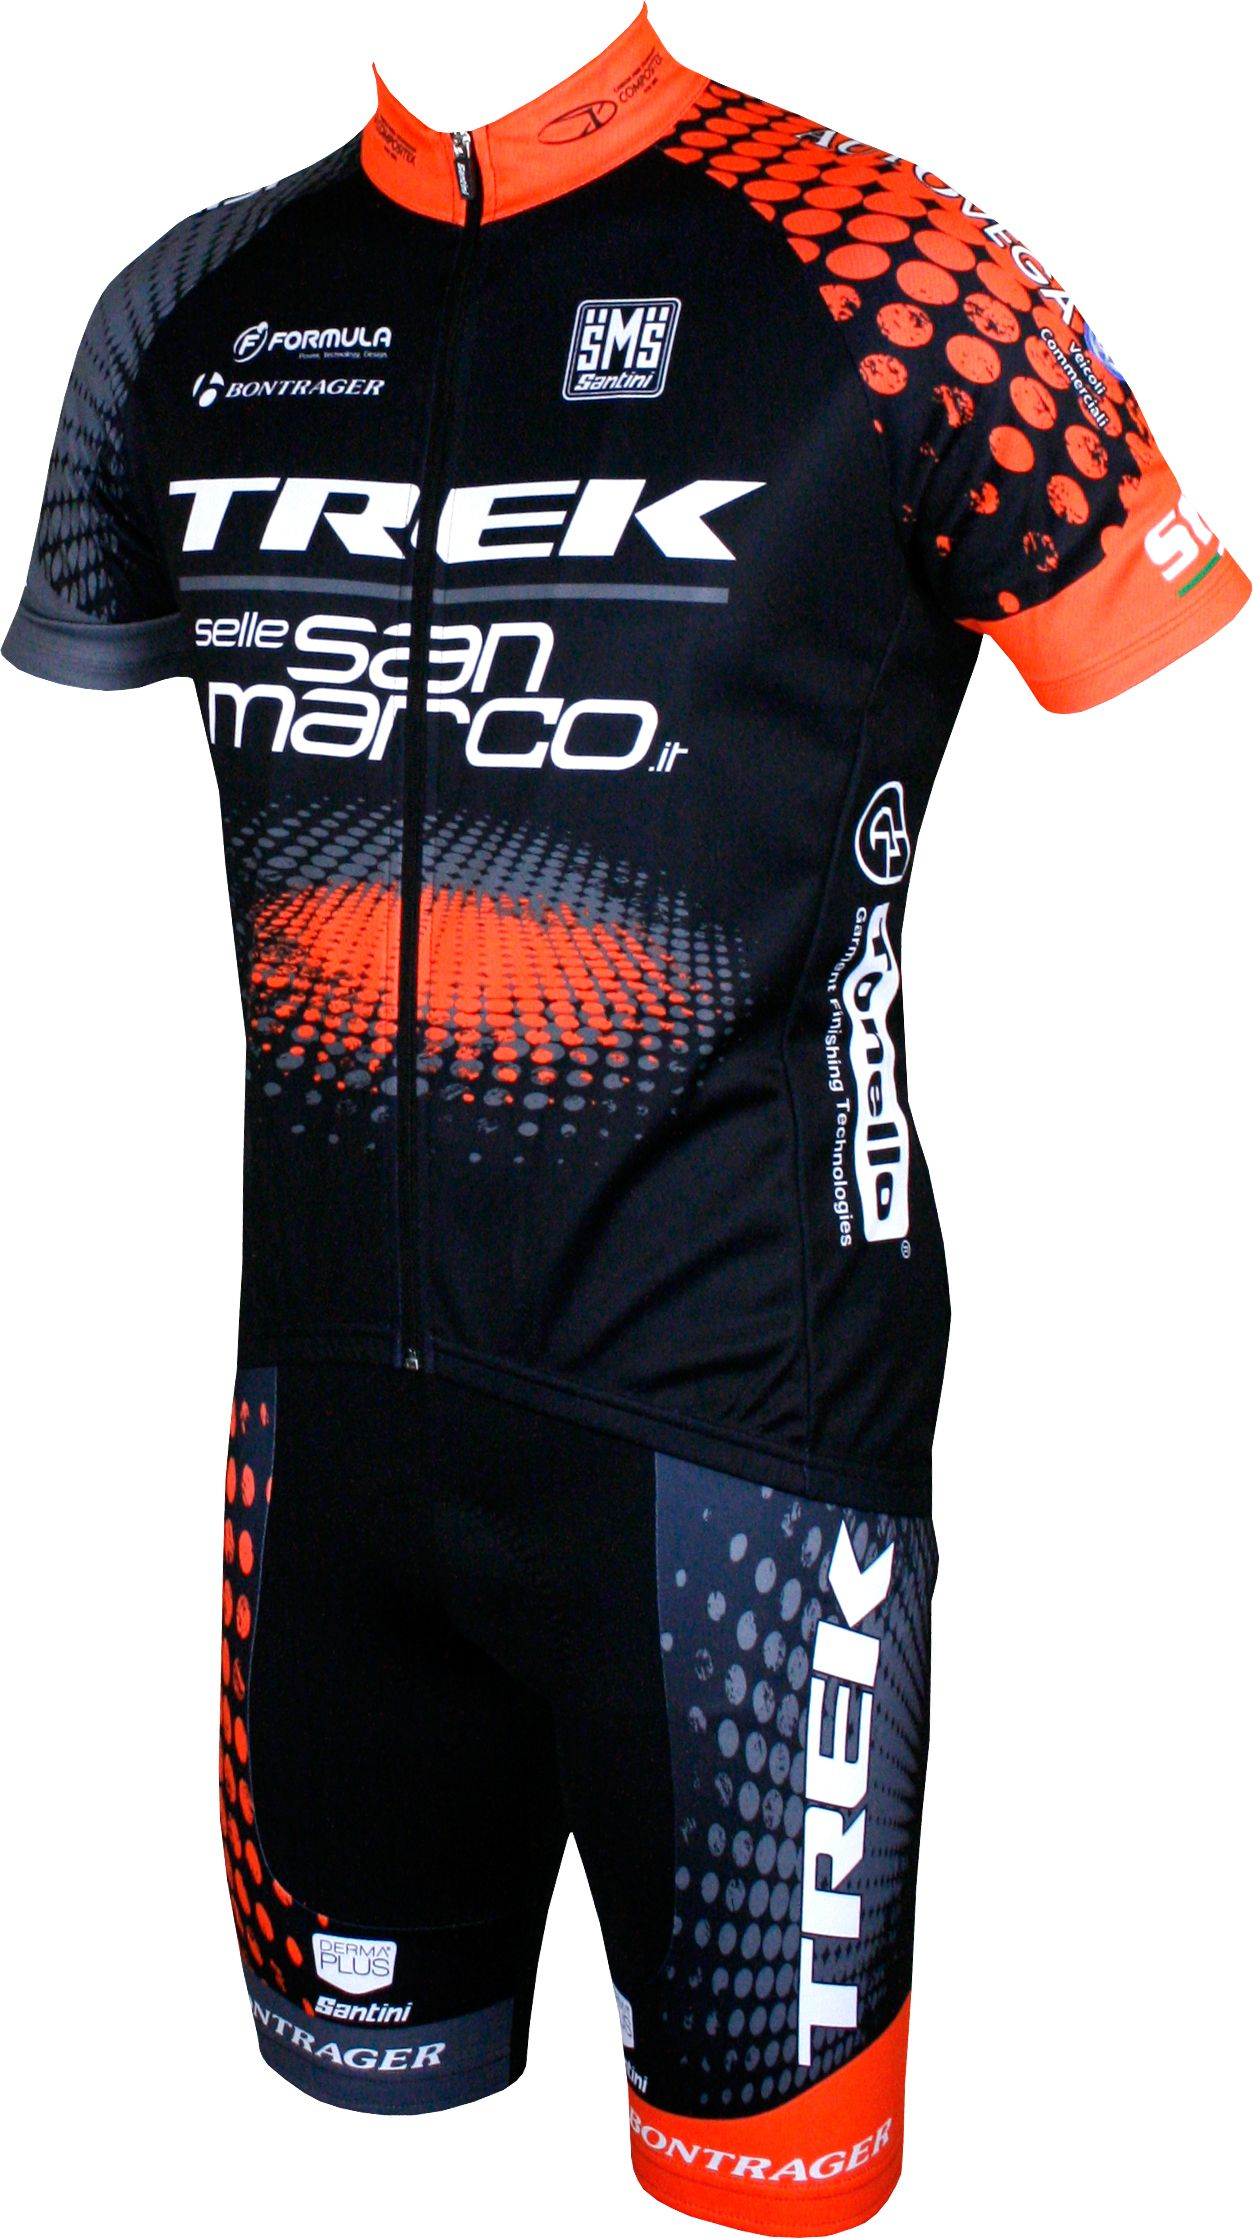 16fb54667ff TREK-SELLE SAN MARCO 2016. TREK-SELLE SAN MARCO 2016 Cycling Clothes